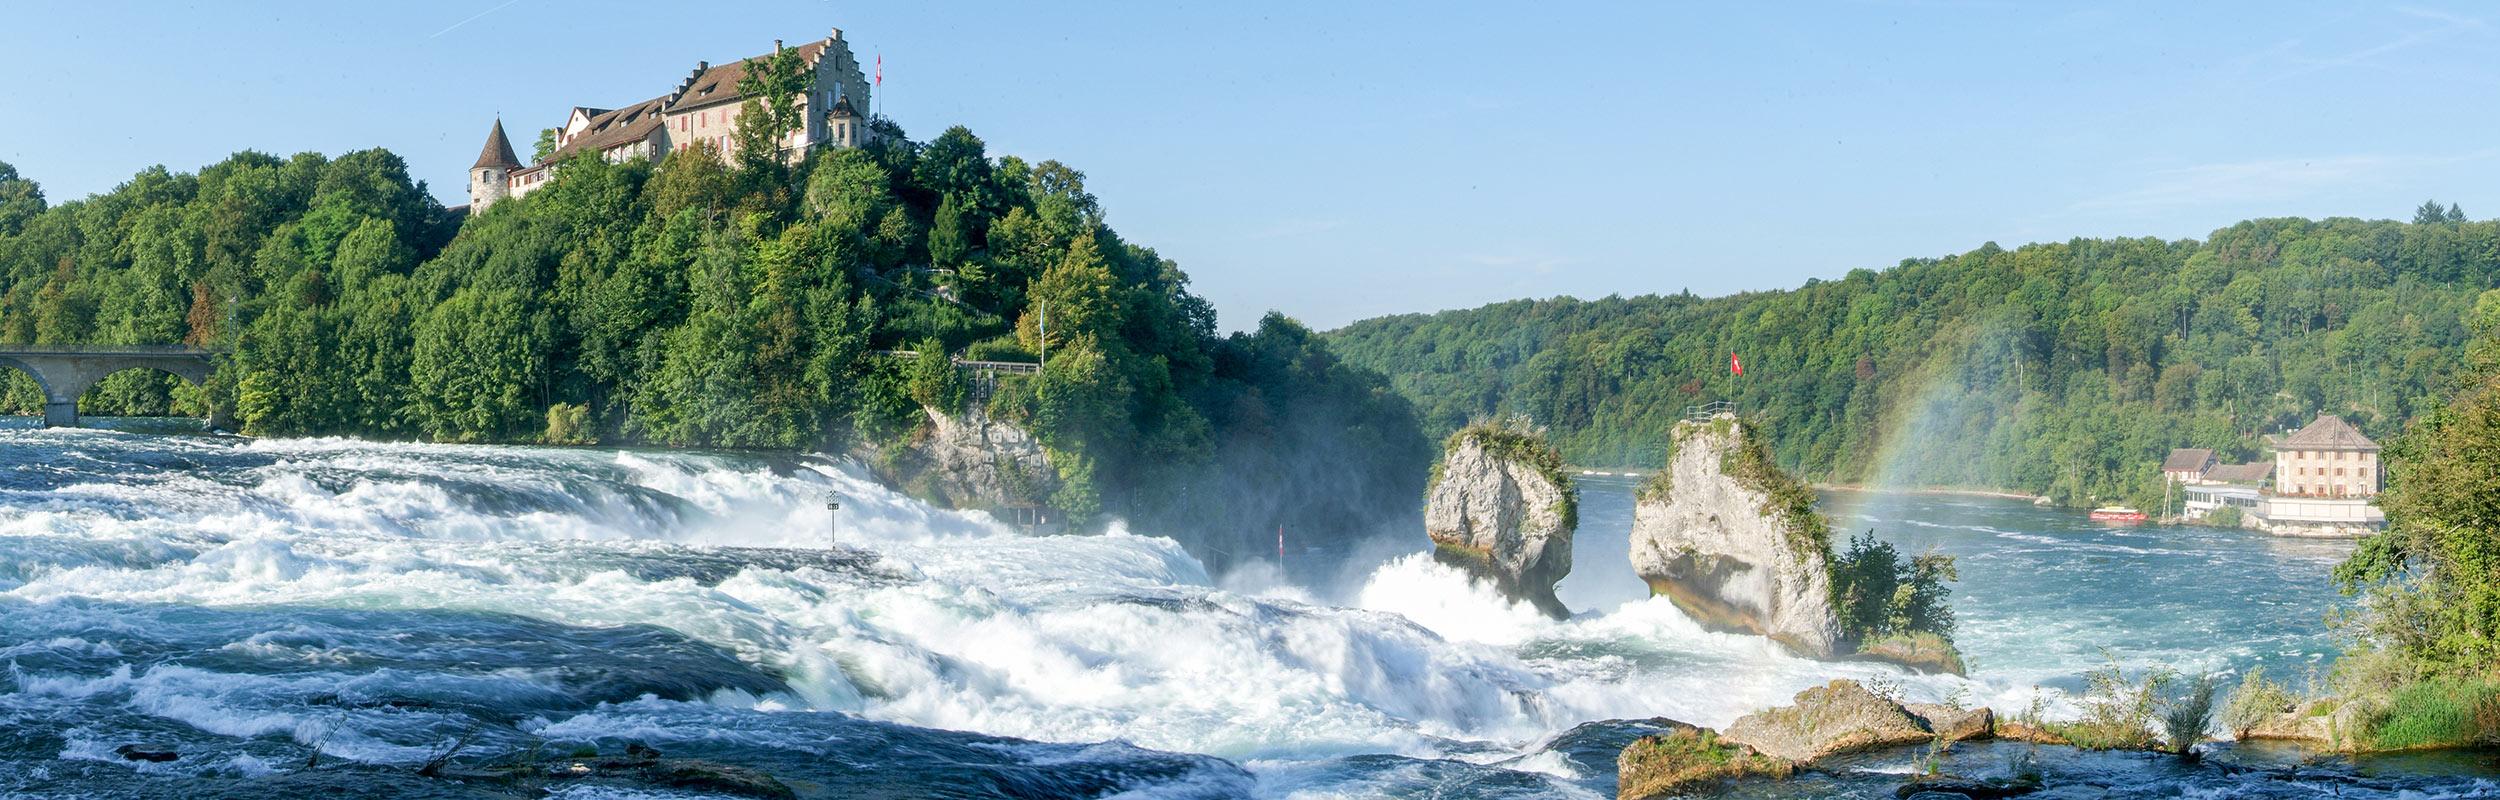 Rheinfall in Neuhausen